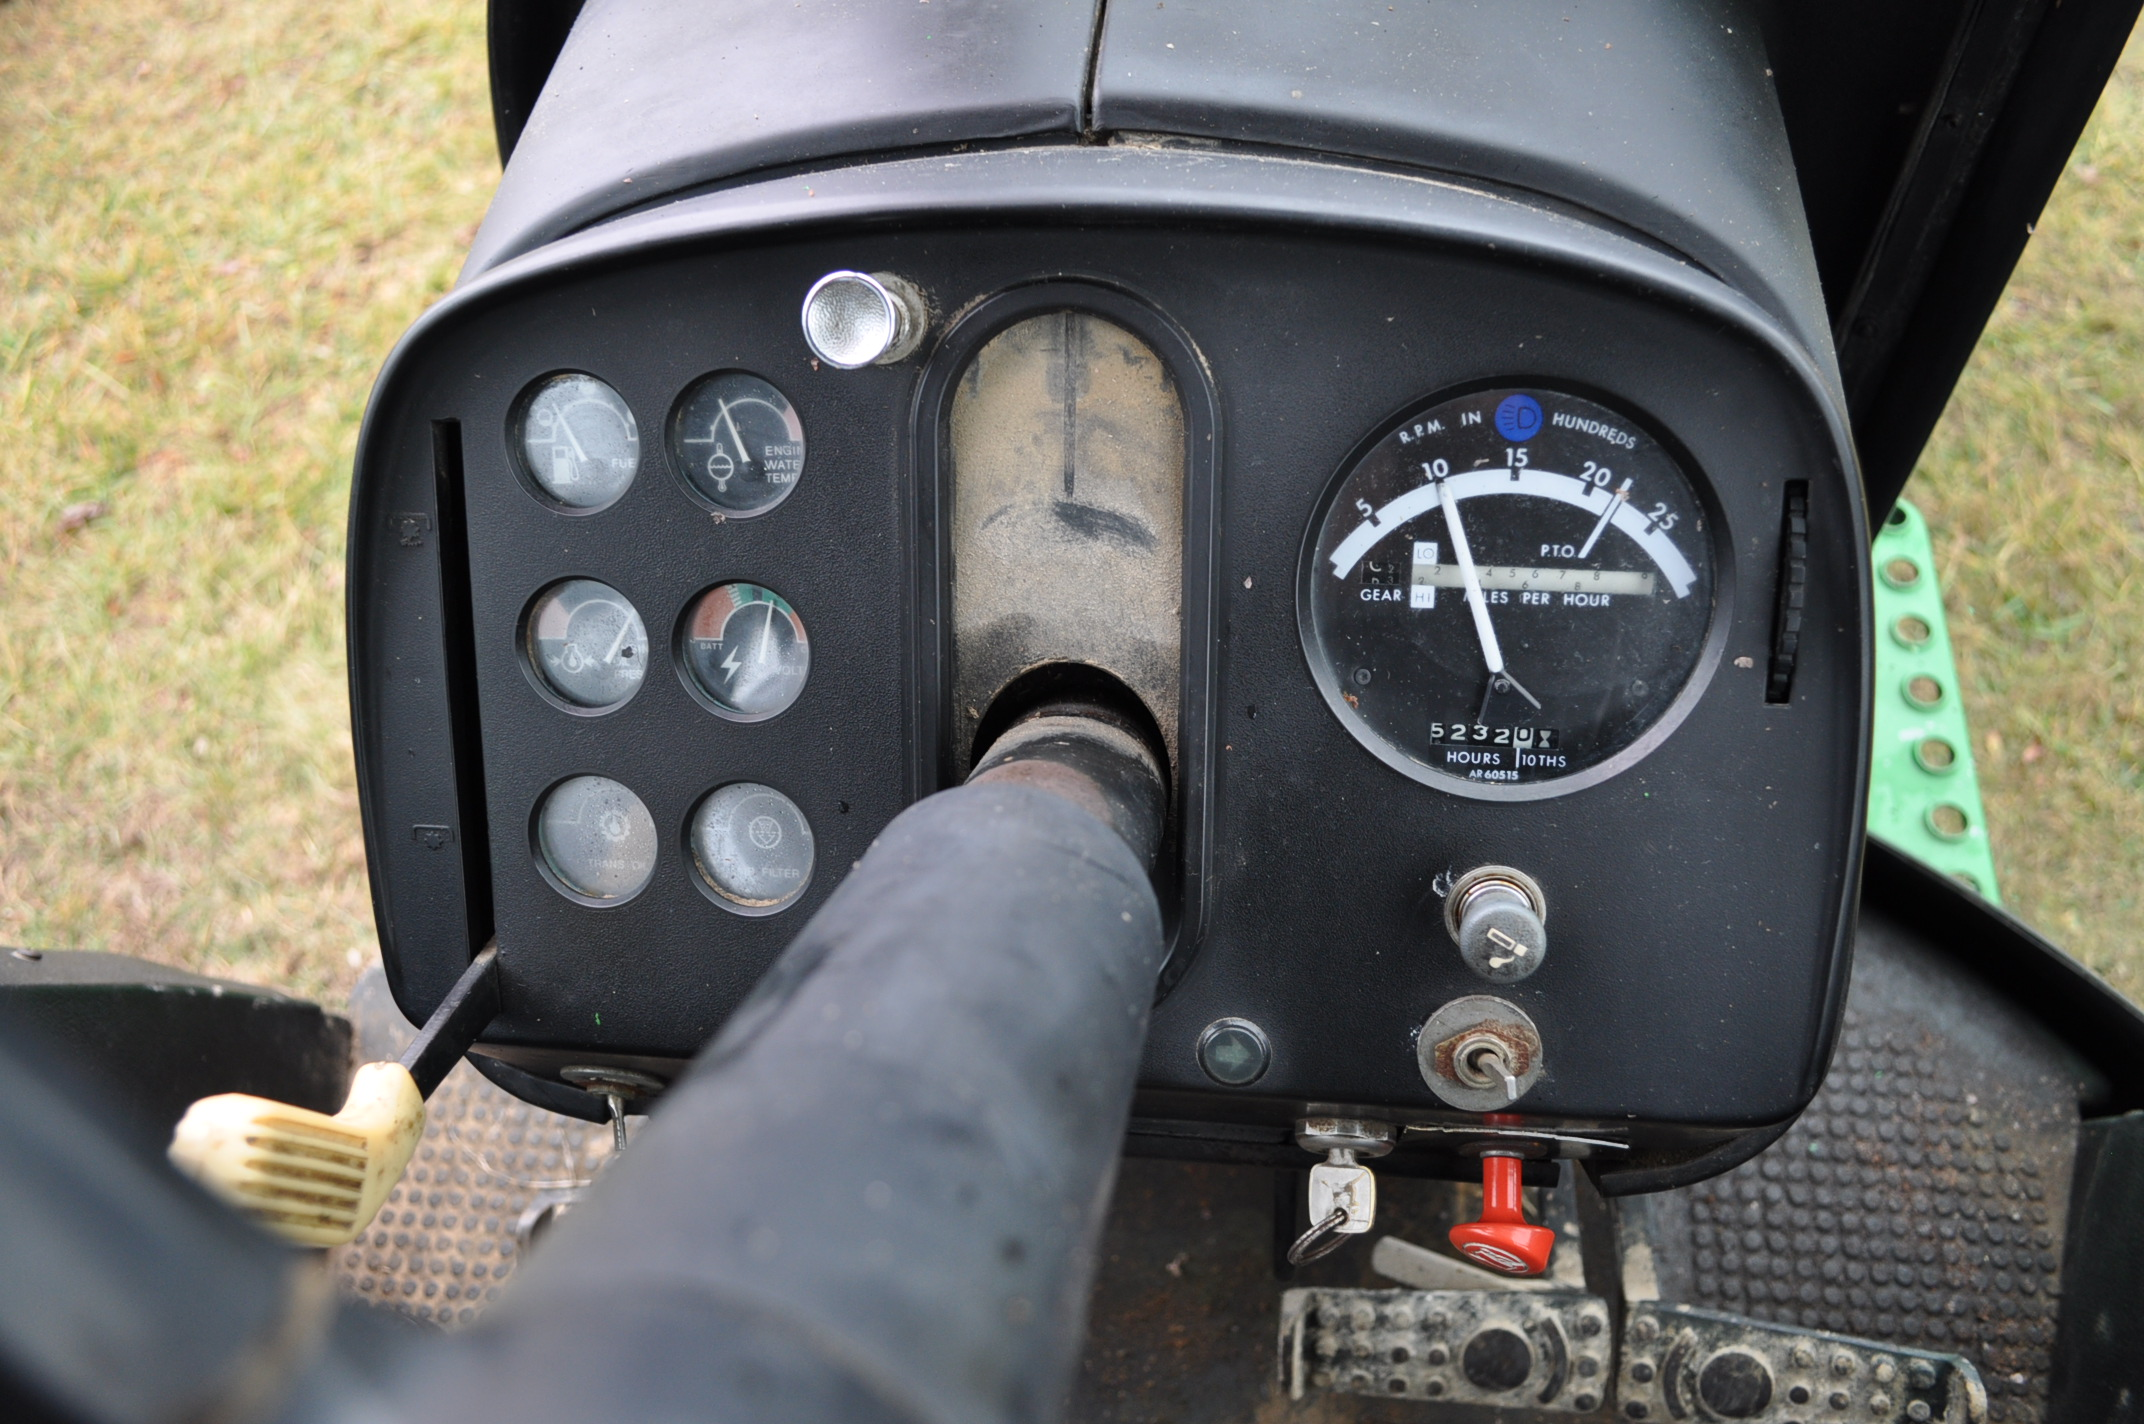 John Deere 4230 tractor, diesel, 18.4-34 hub duals, 10.00-16 front, CHA, Quad range, 2 hyd - Image 21 of 23